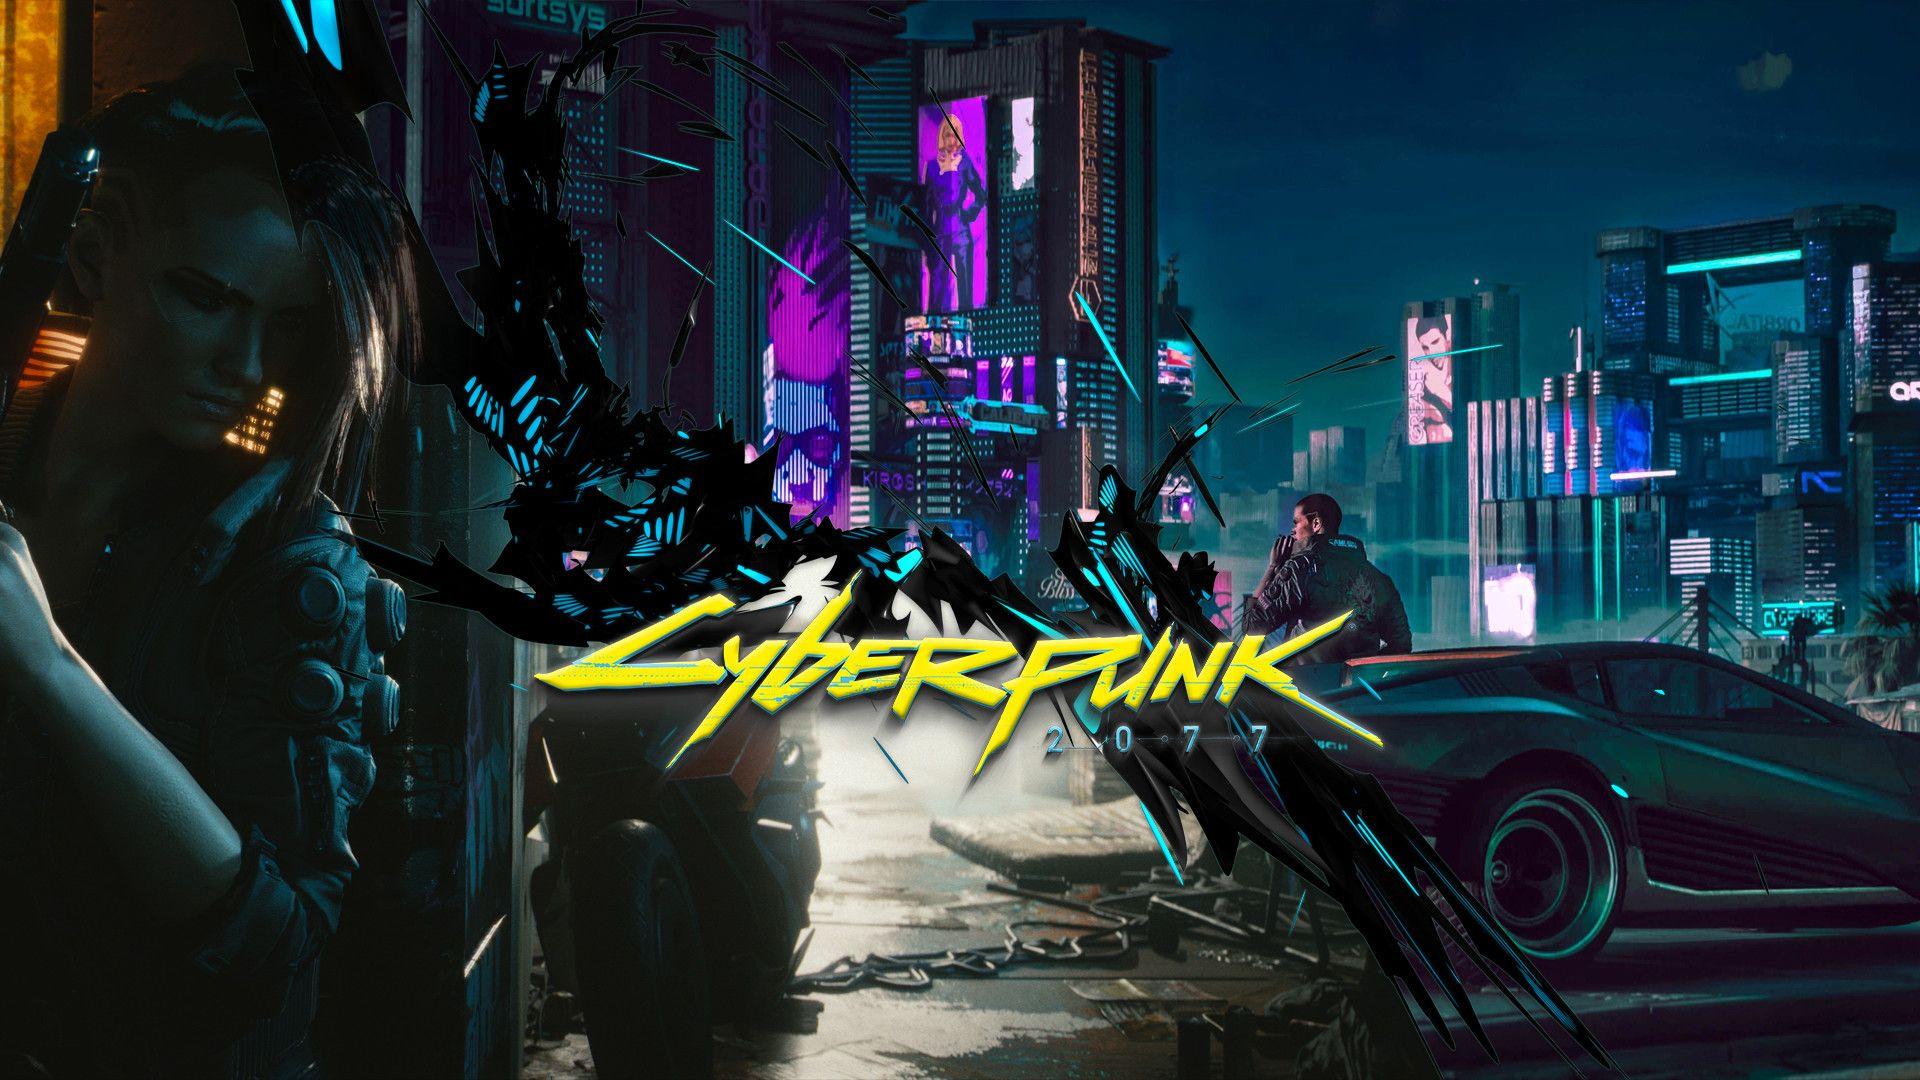 cyberpunk wallpaper hd free